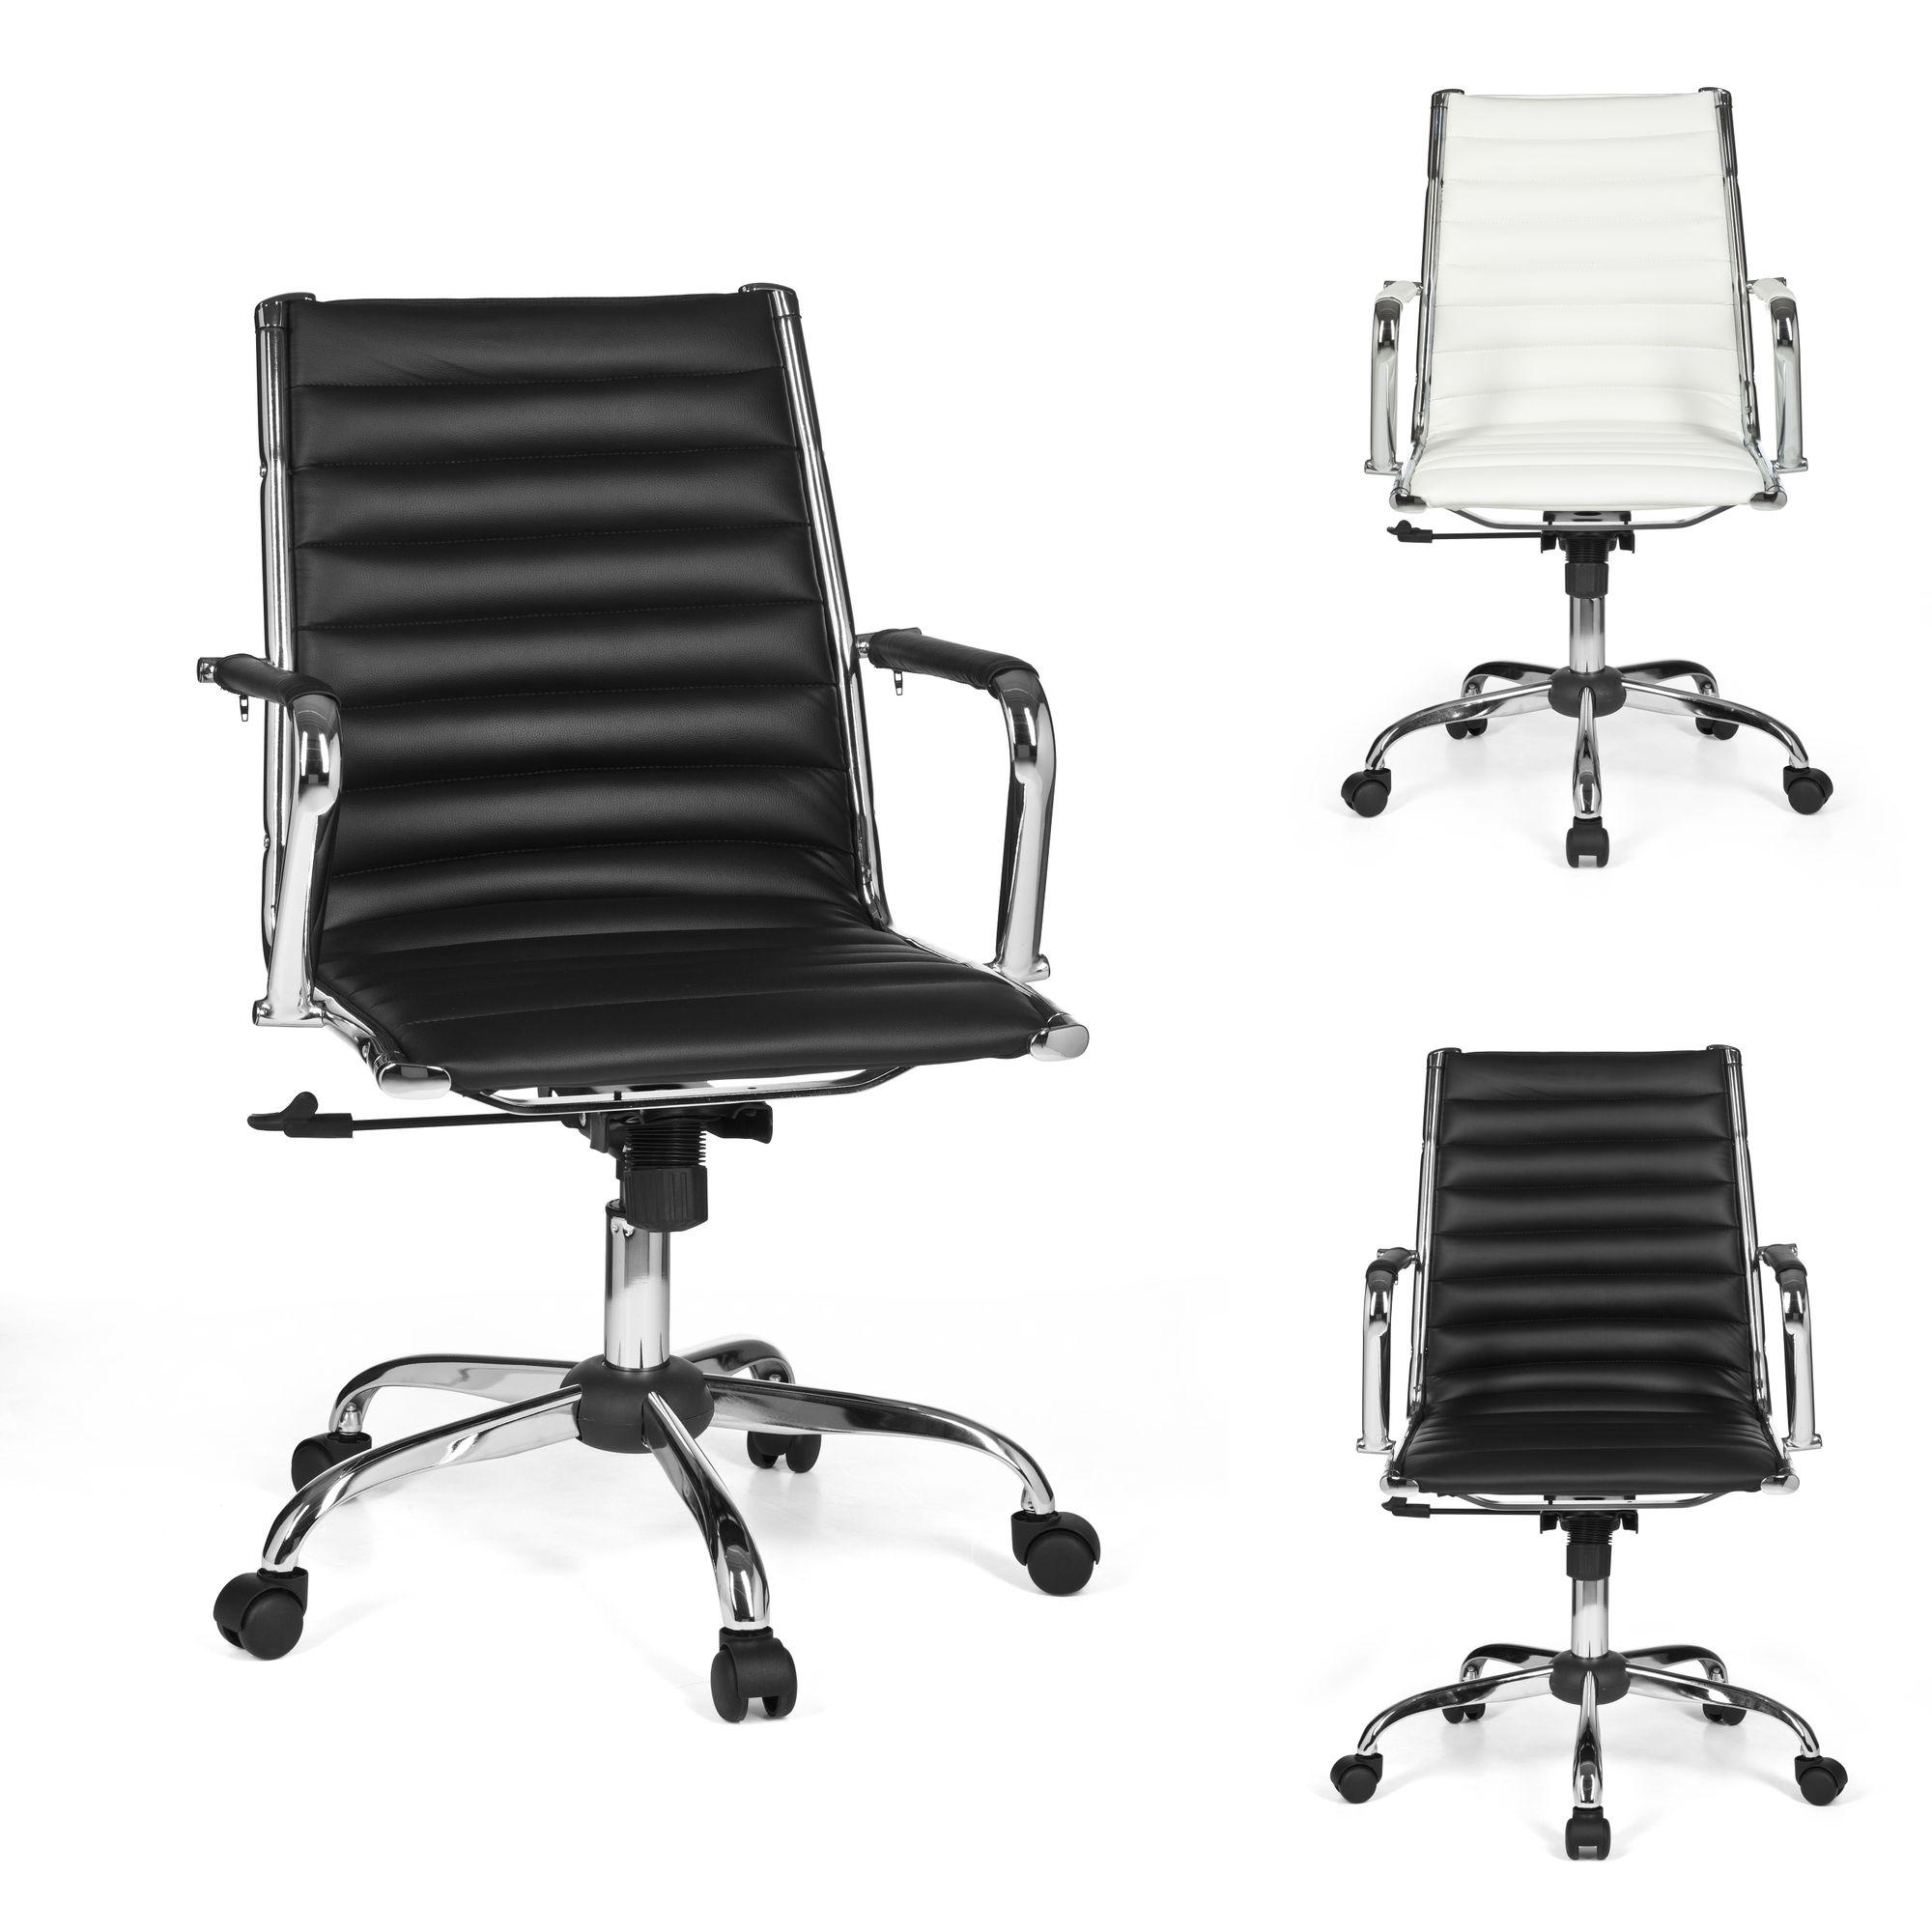 Design Bürostuhl GENUA Schreibtischstuhl Chefsessel Büro Sessel Konferenzstuhl